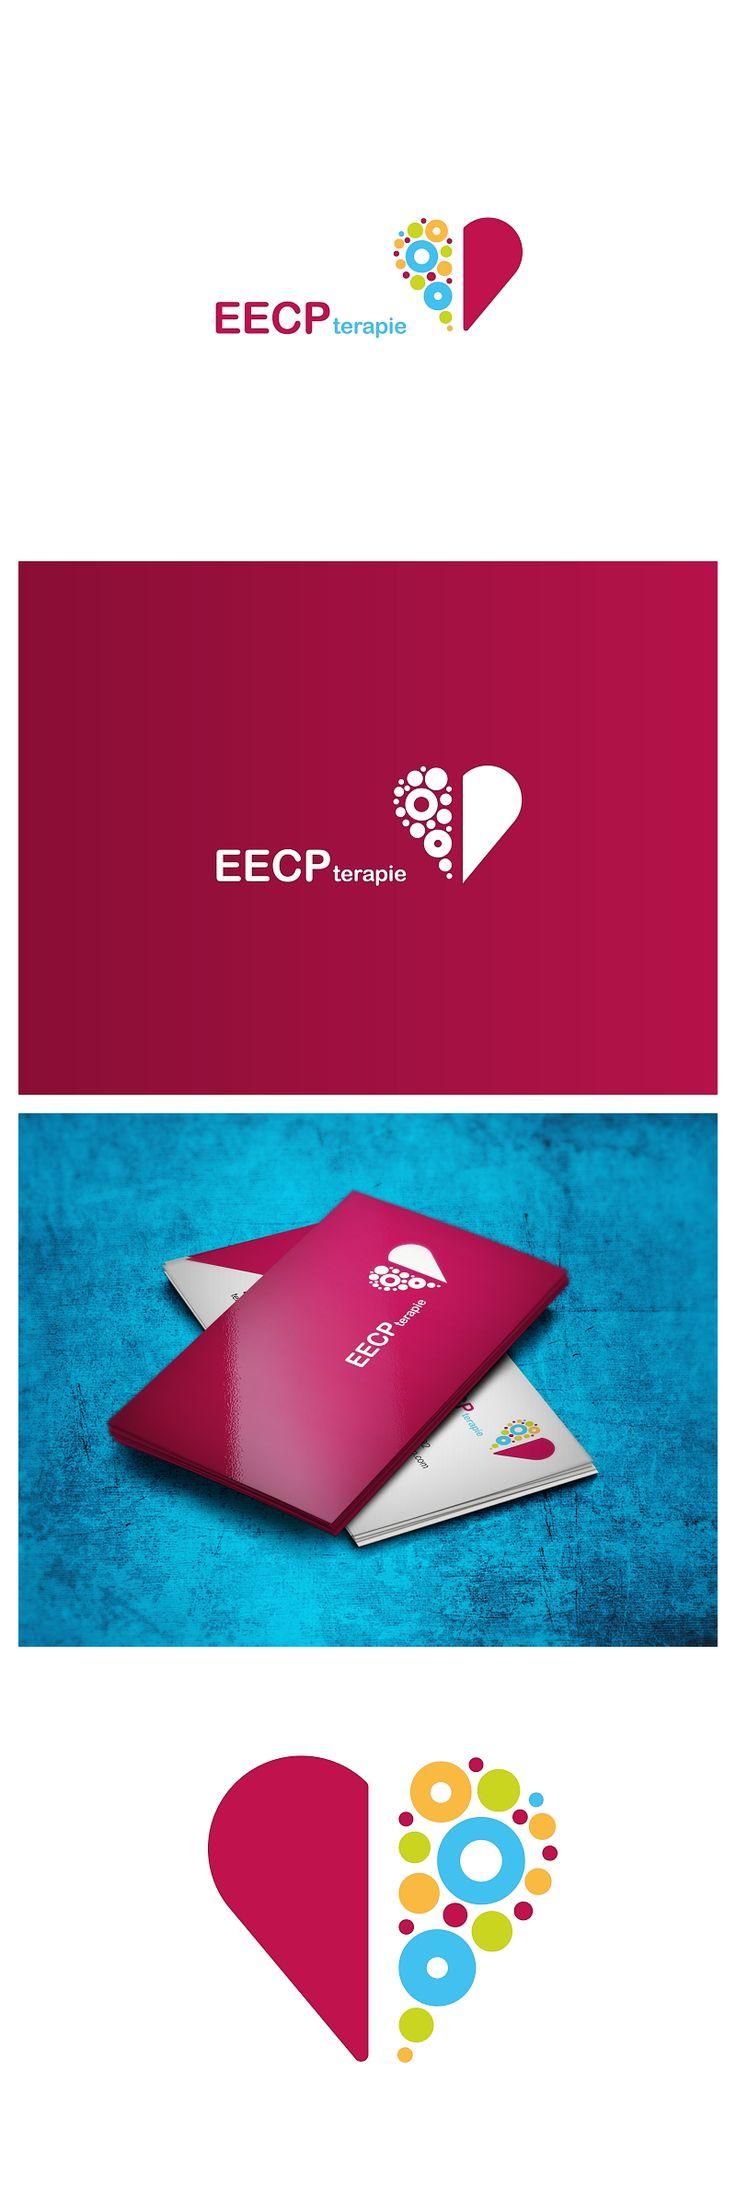 EECP brand